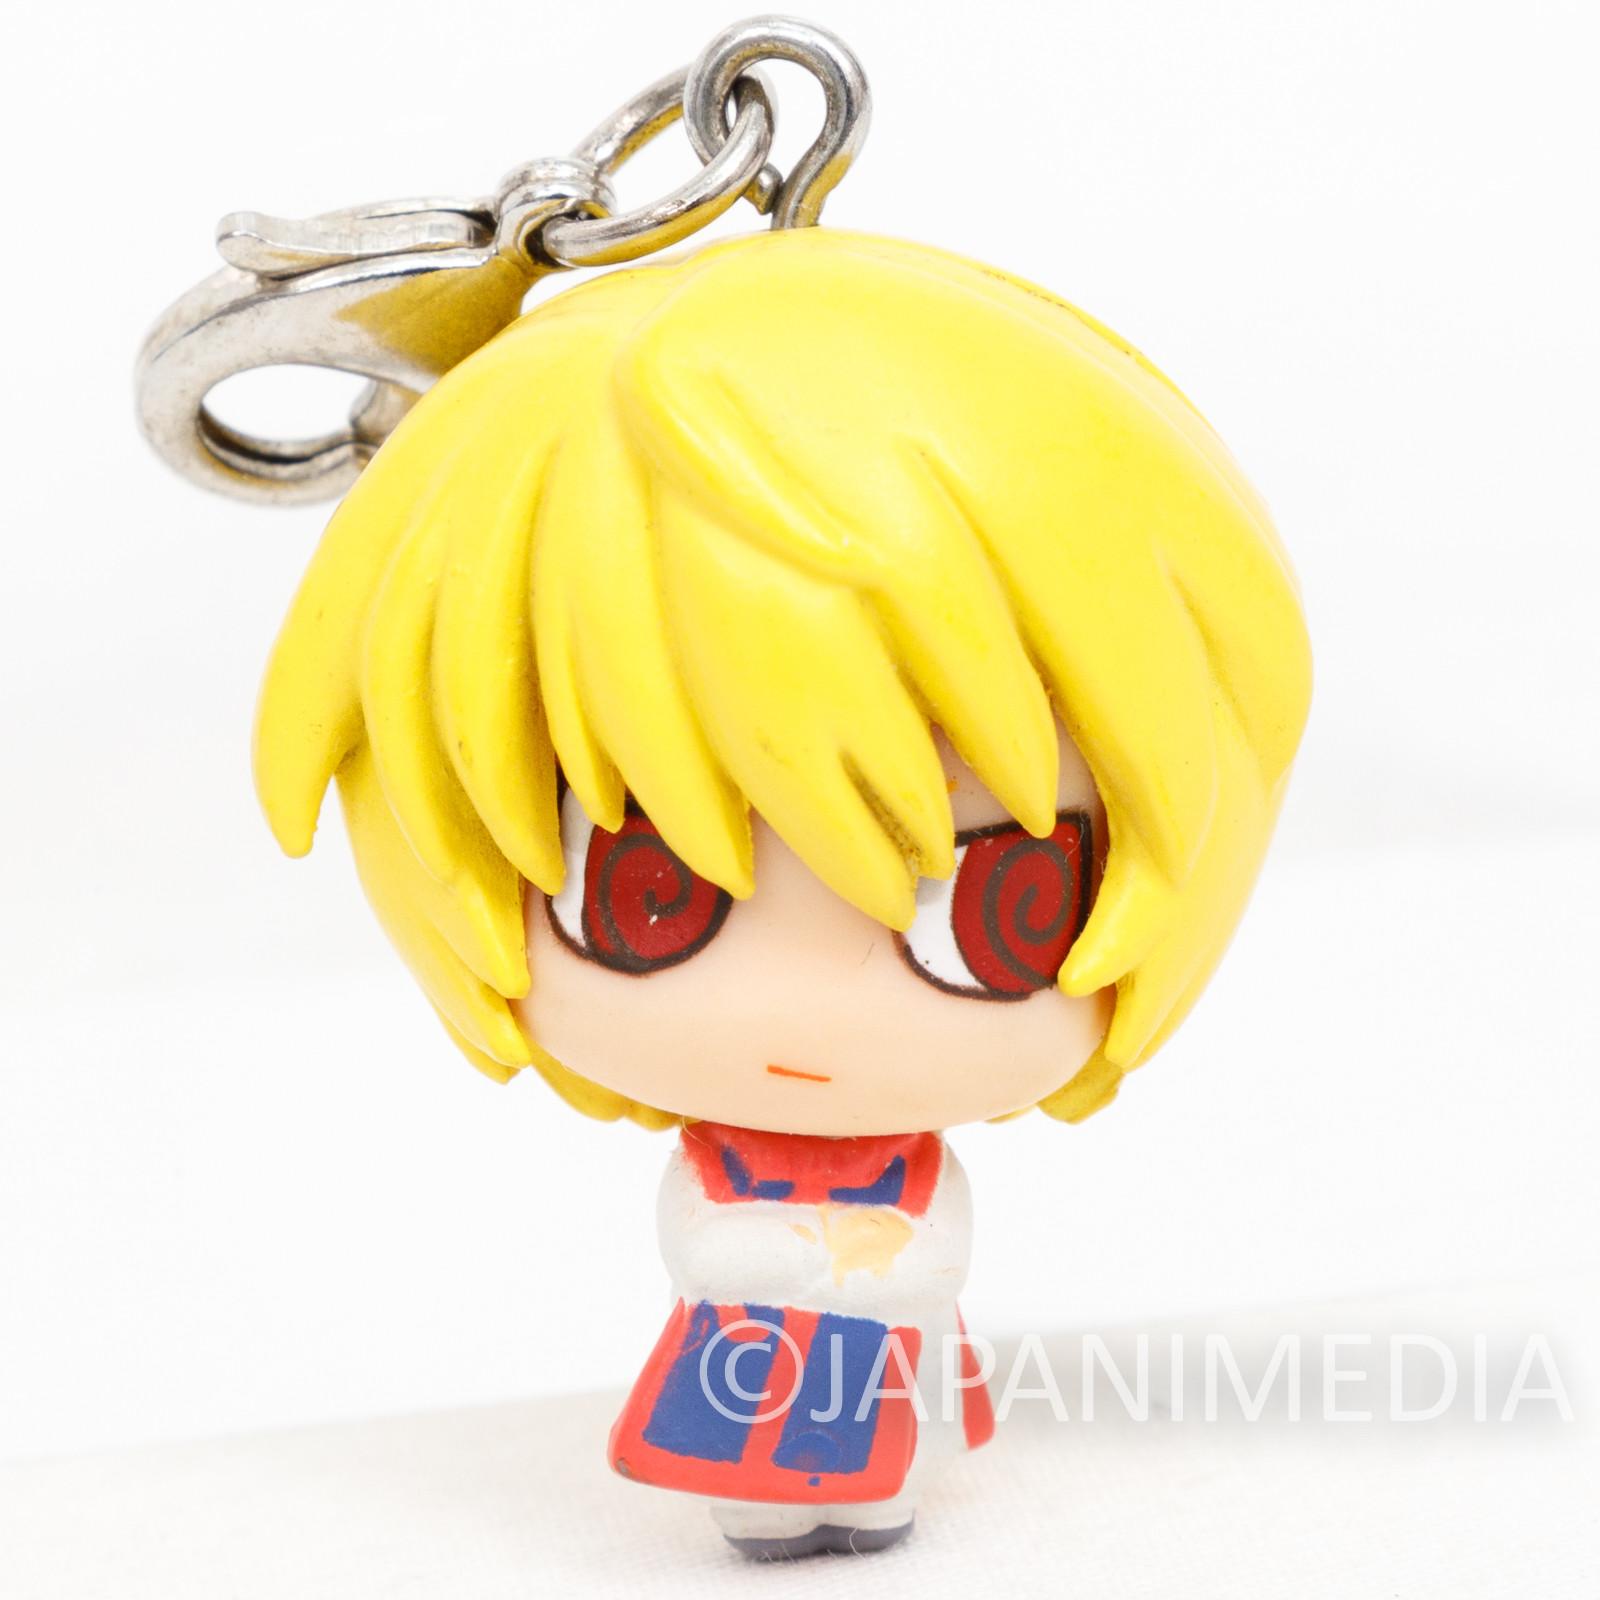 RARE! HUNTER x HUNTER Kurapika Scarlet Eyes Mini Figure Chara Fortune Megahouse 2